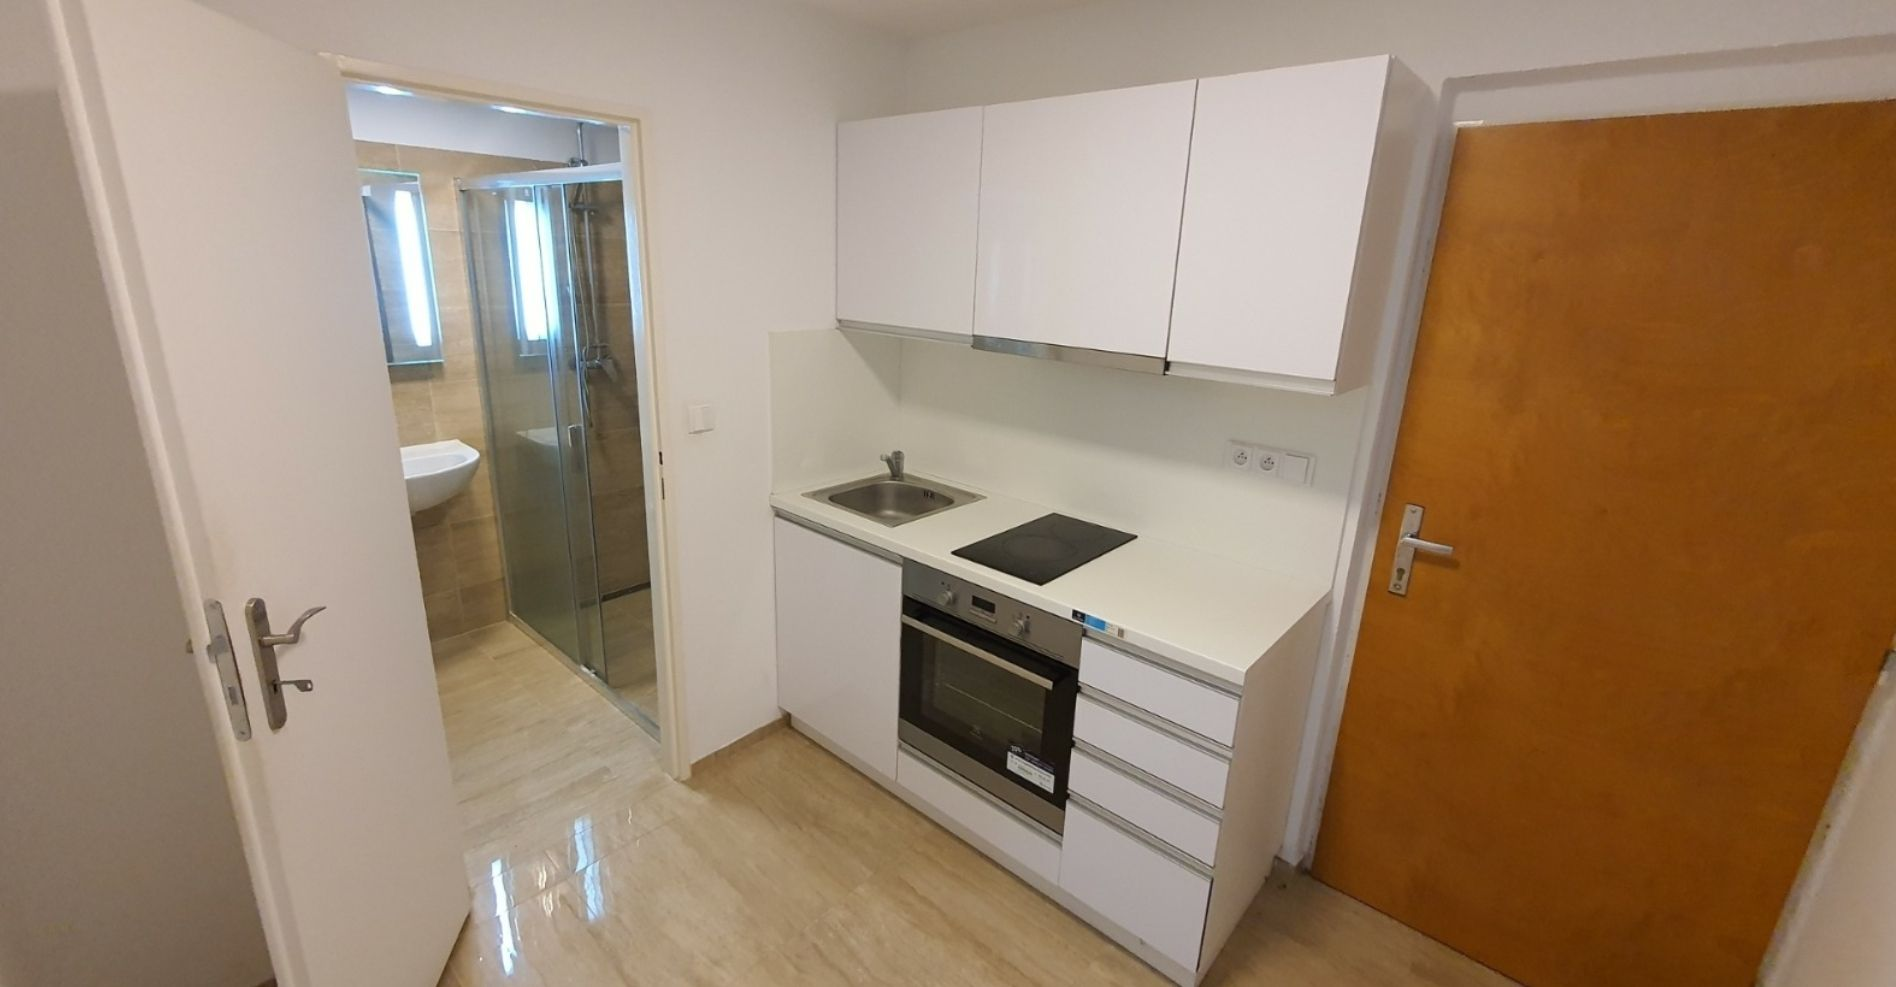 Prodej bytu 1+kk, 28m2, Praha 4 - Pankrác